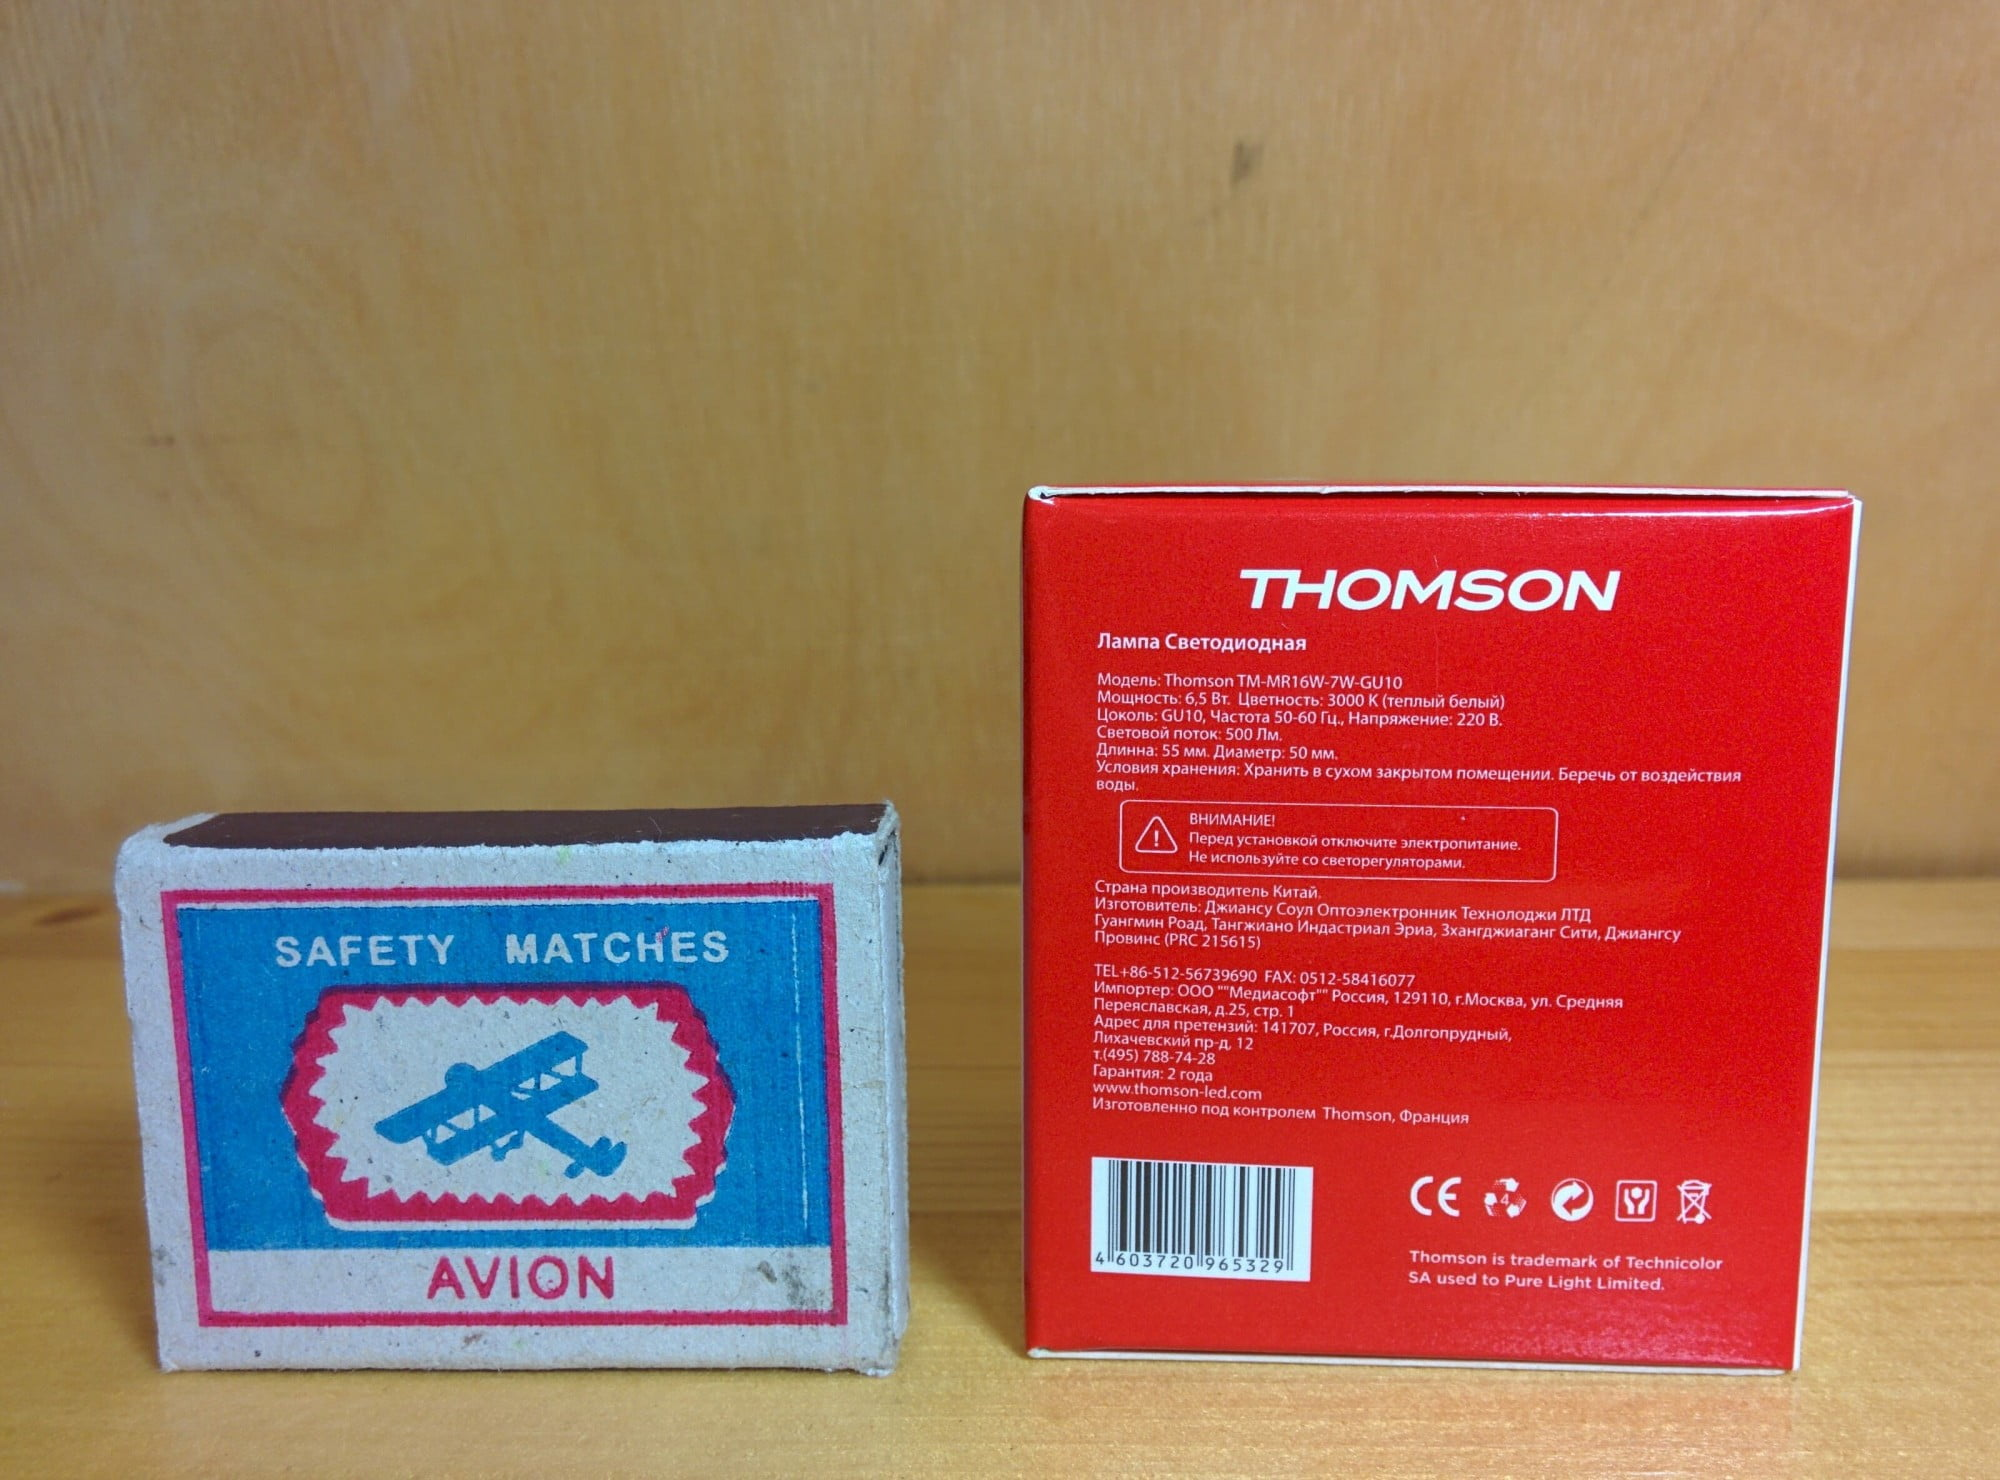 Thomson TM-MR16W-7W-GU10 характеристики